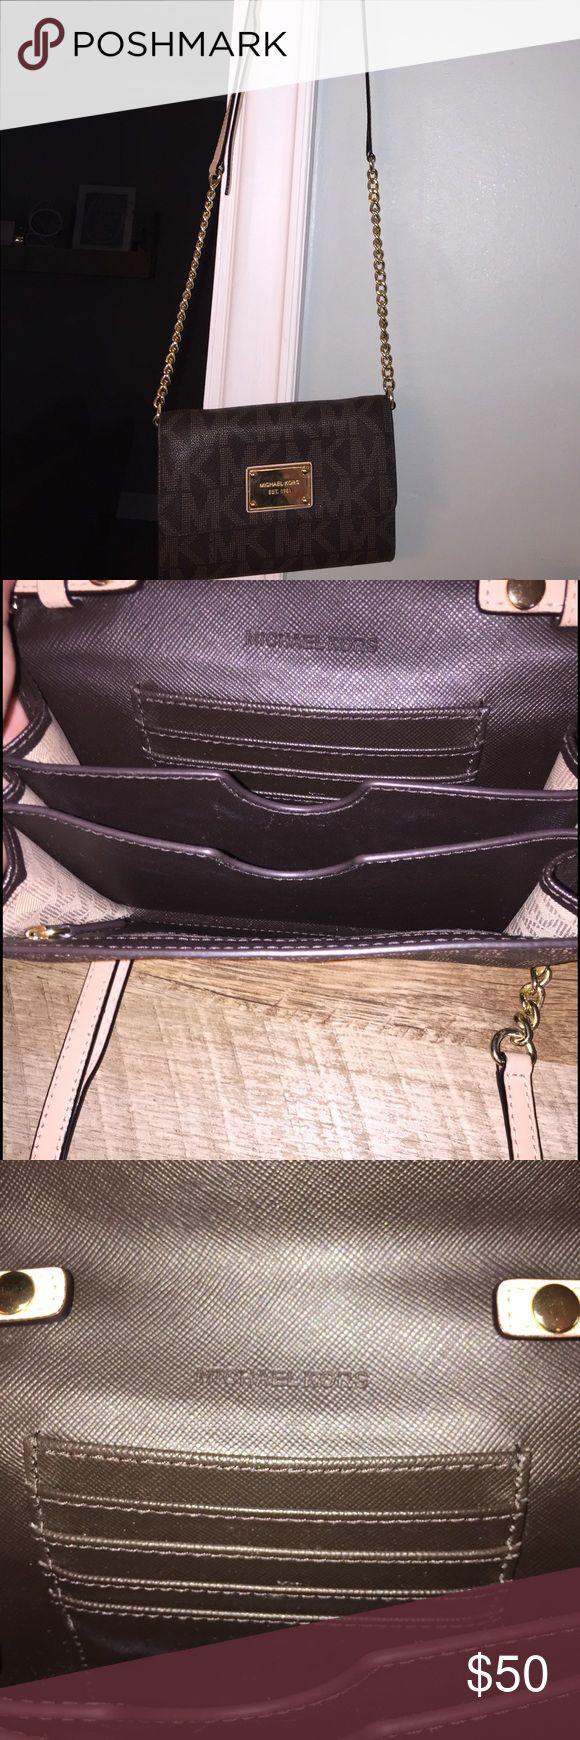 Michael Kors crossbody wallet Brand new without tags Michael Kors MK logo crossbody wallet size handbag Michael Kors Bags Crossbody Bags